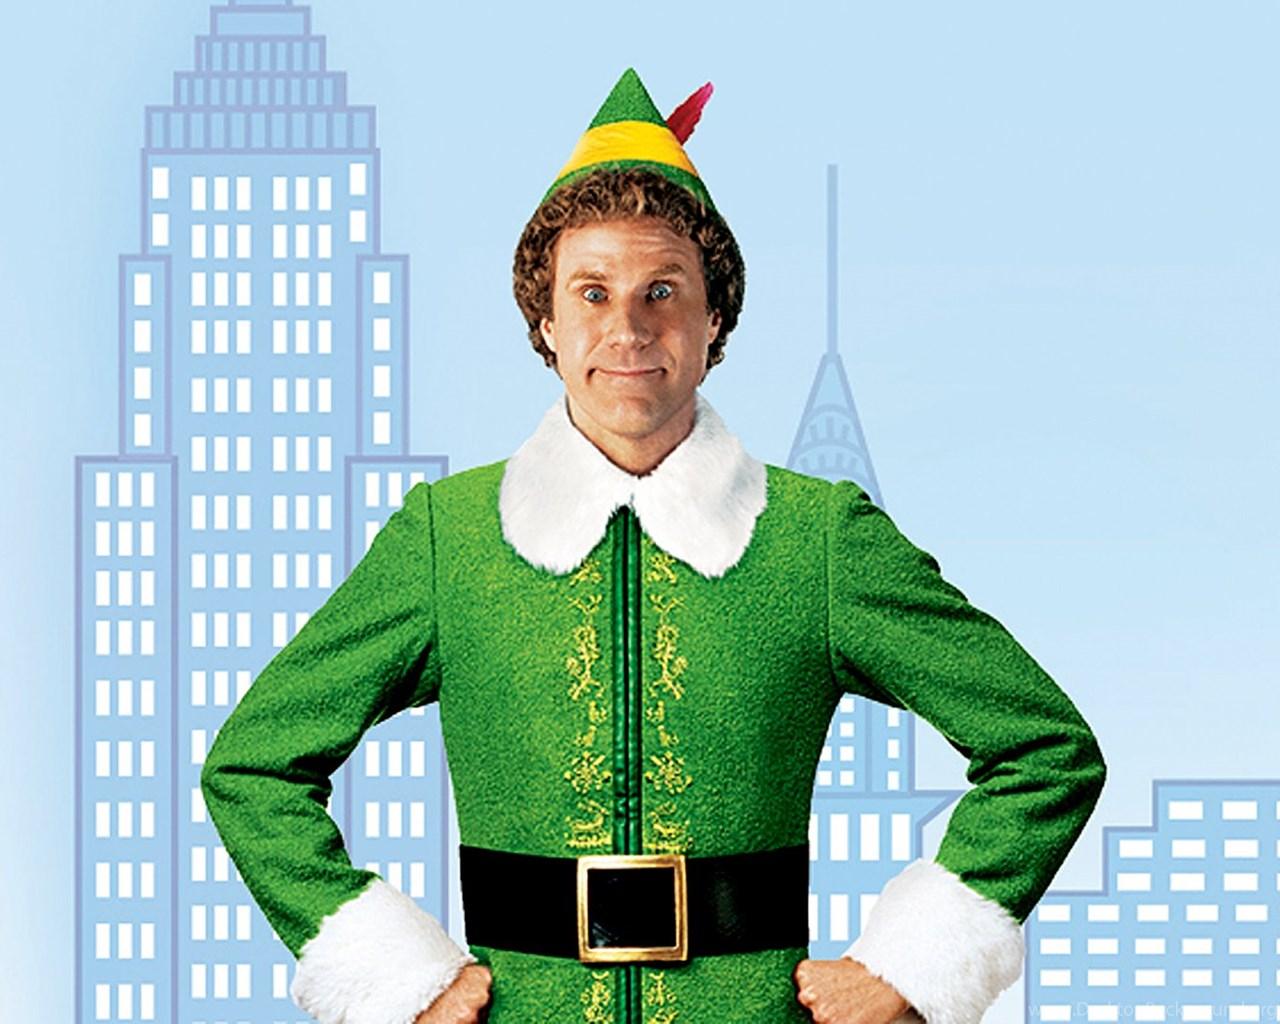 Elf The Movie Wallpaper: Elf Christmas Movie Desktop Background